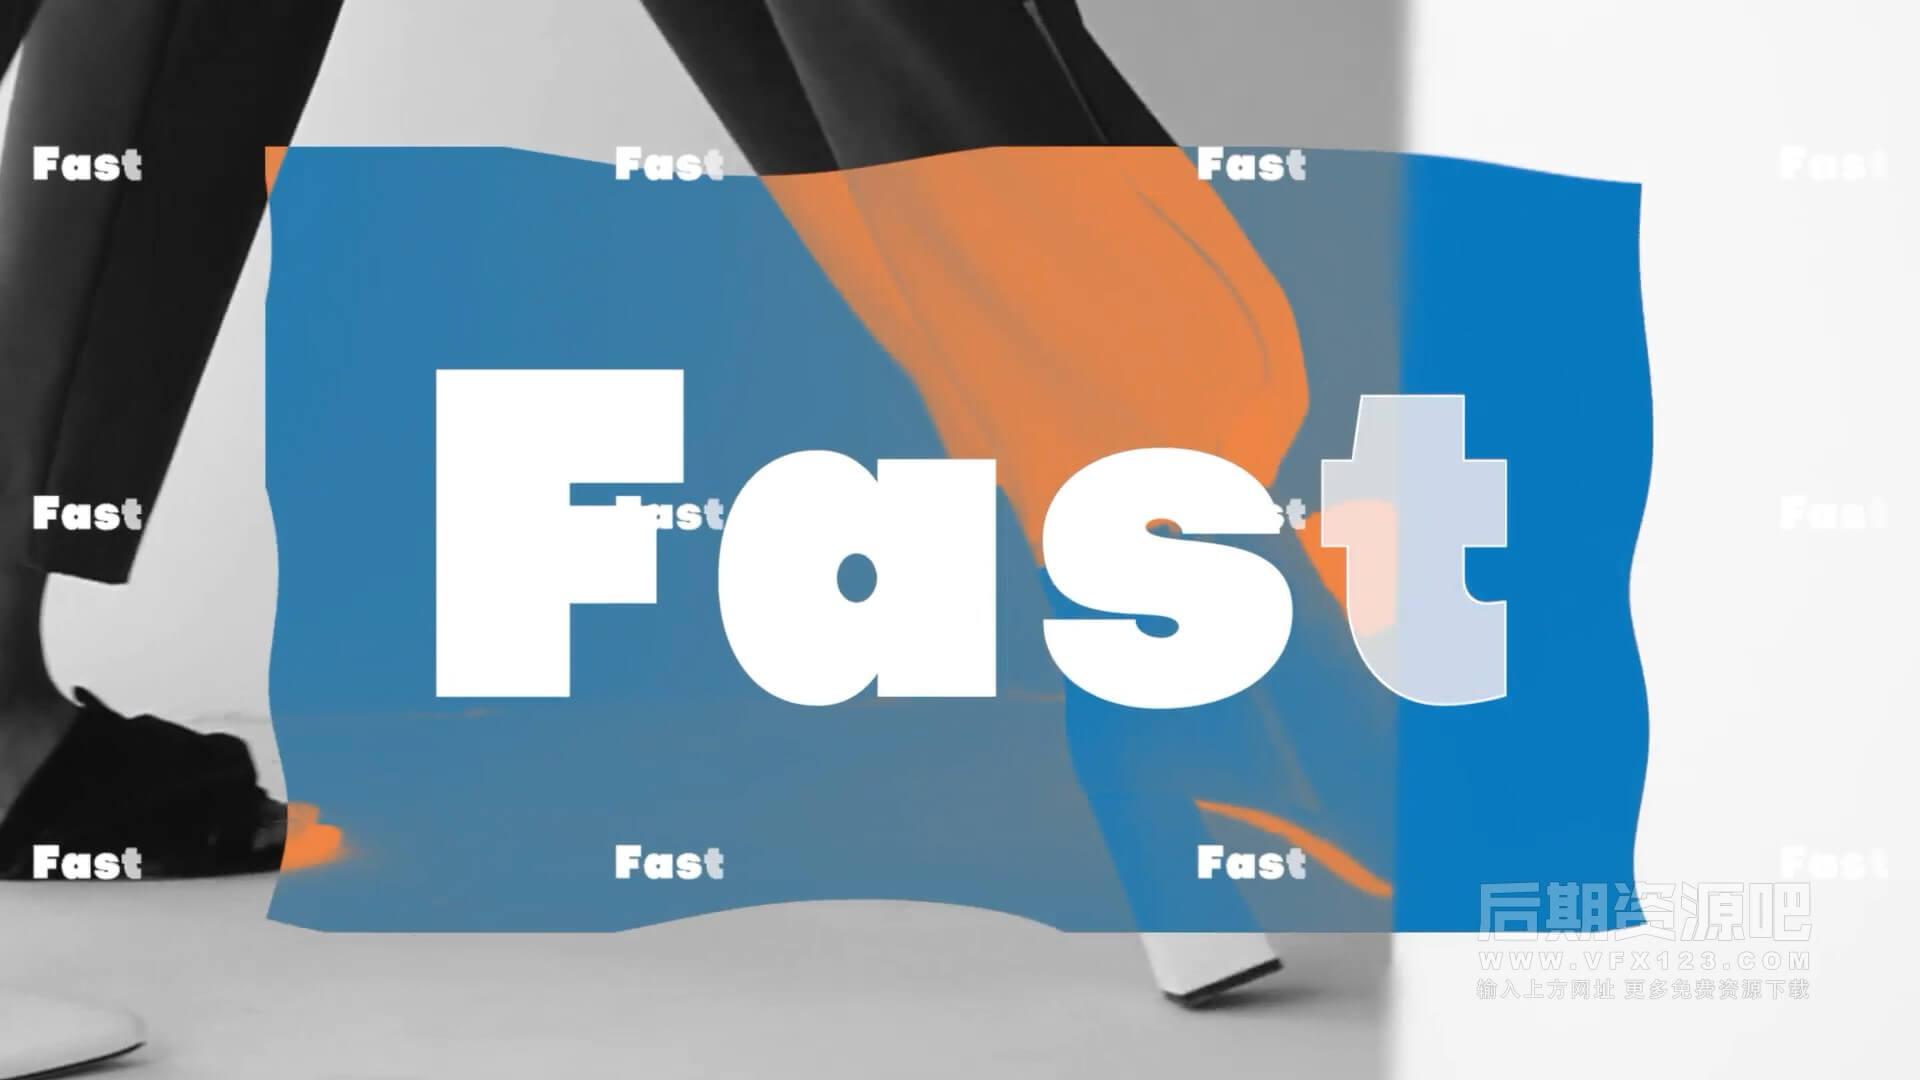 fcpx主题模板 4K快闪大标题卡点图文视频片头模板  Bold Typo Intro